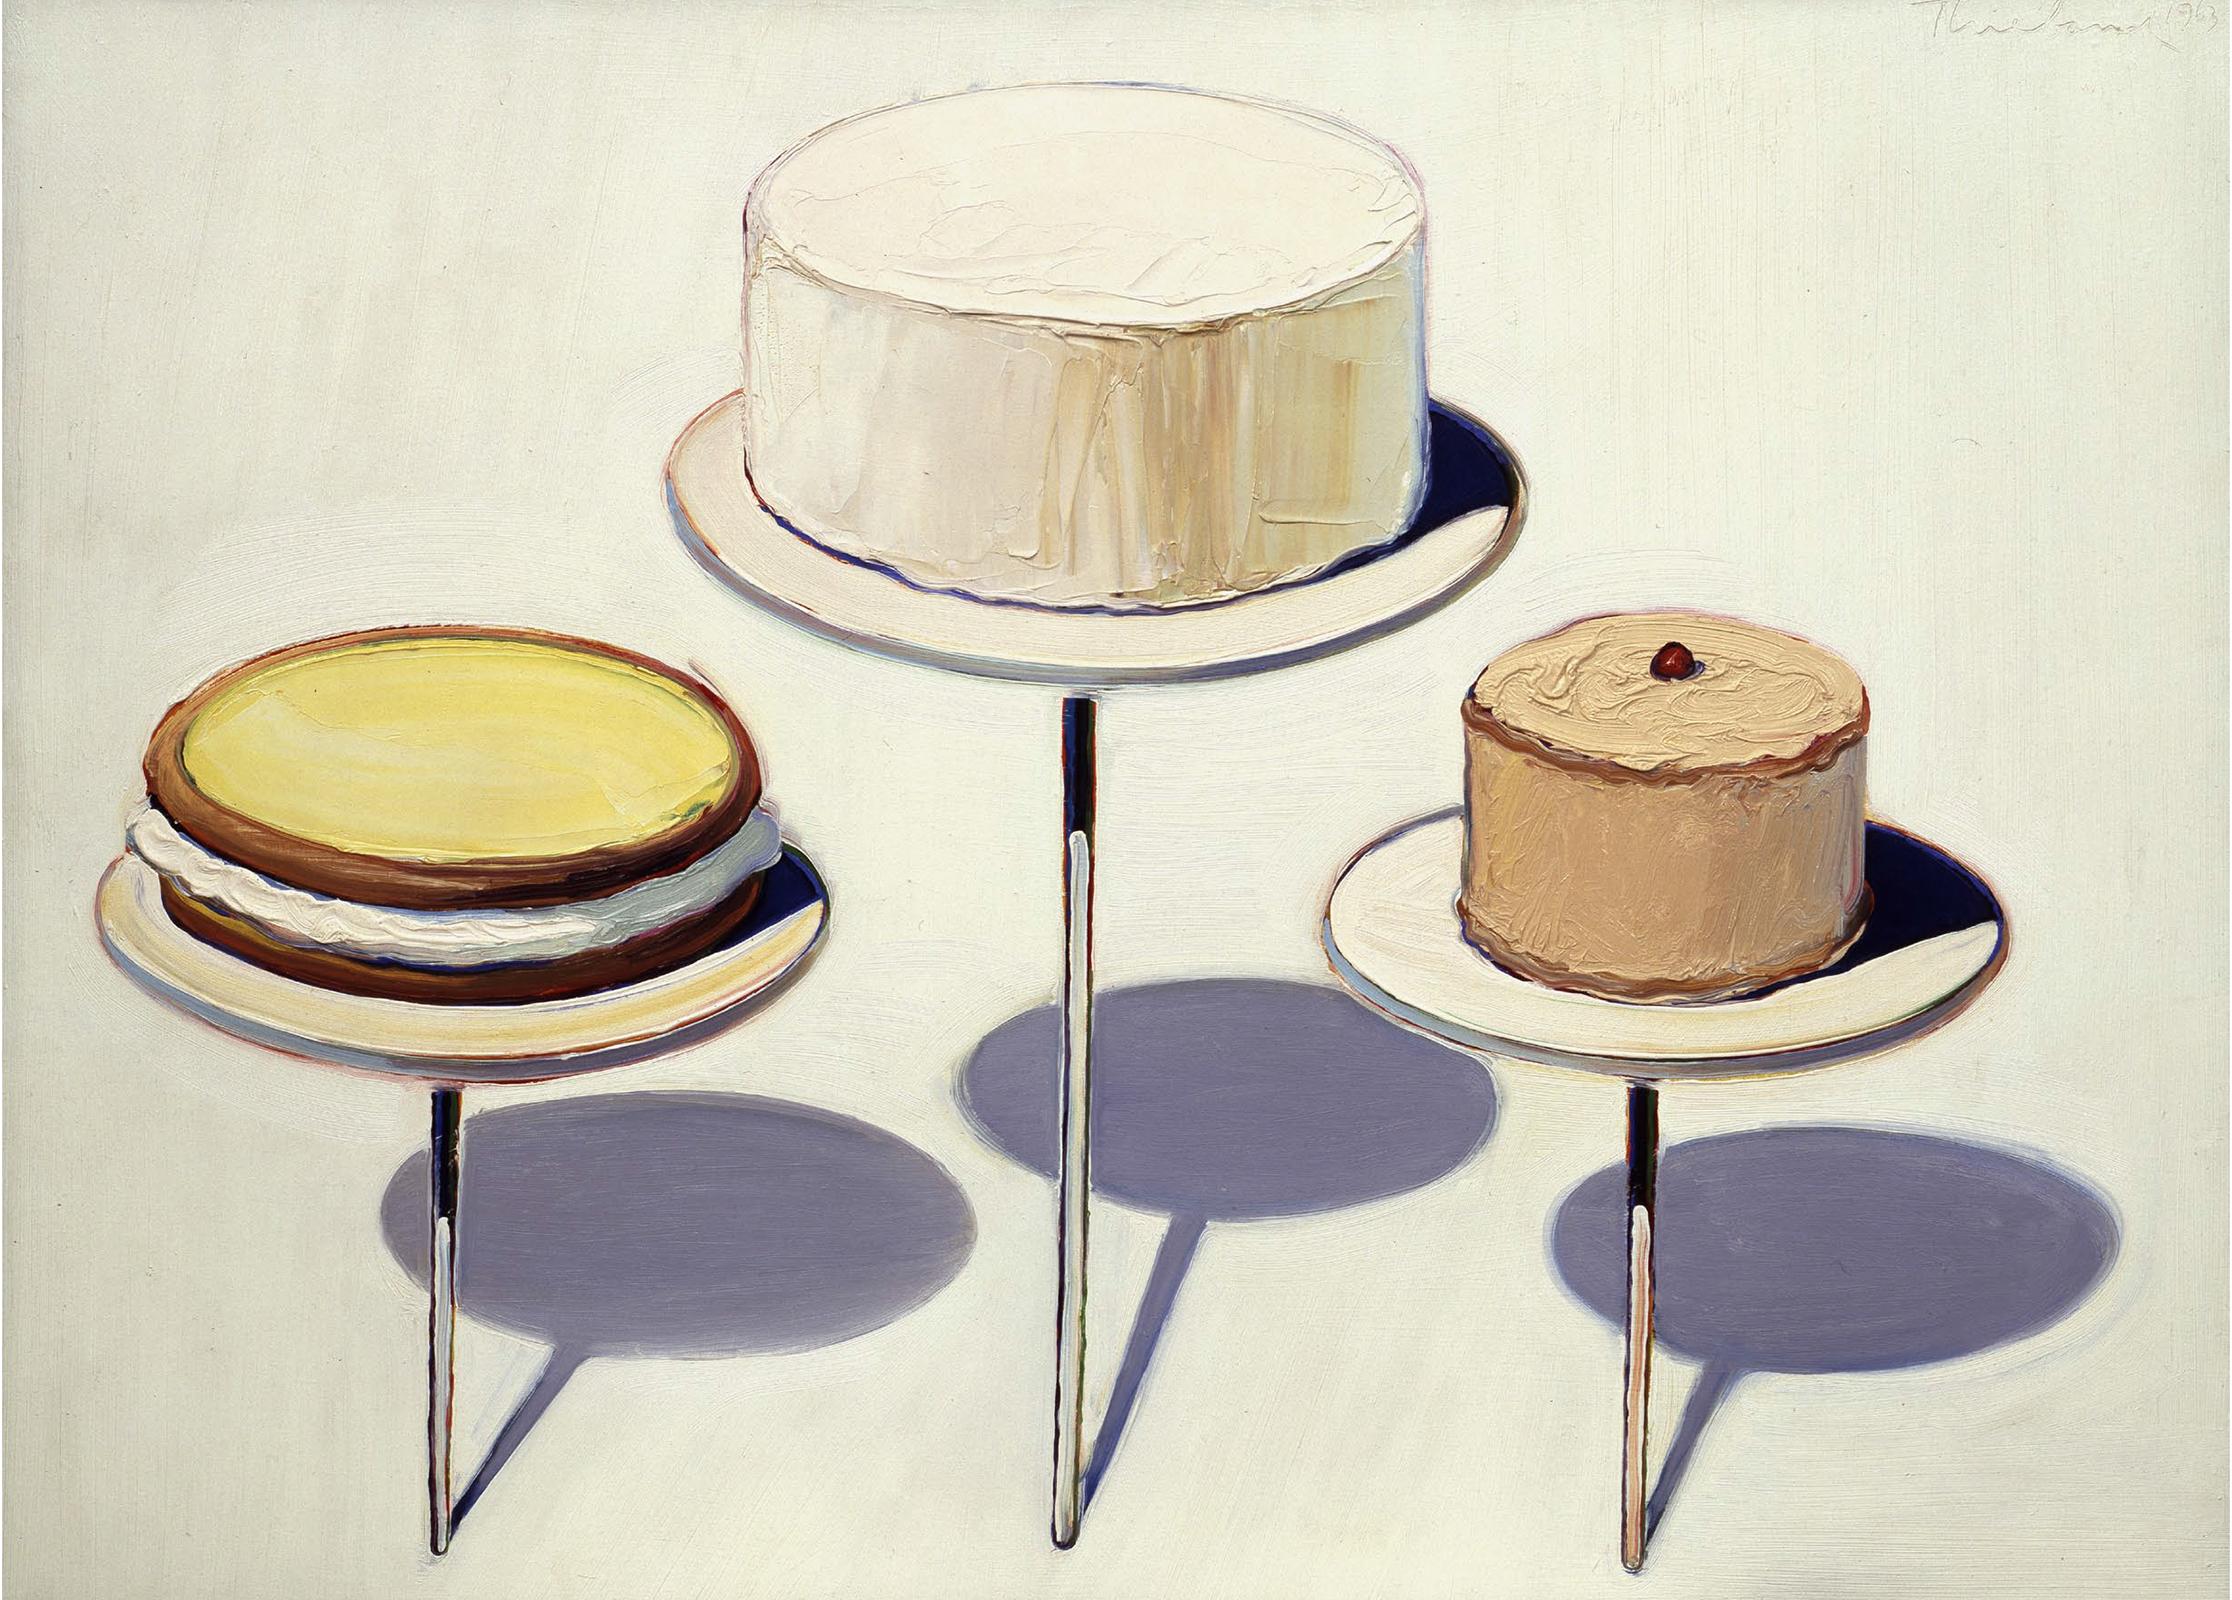 three painted cakes